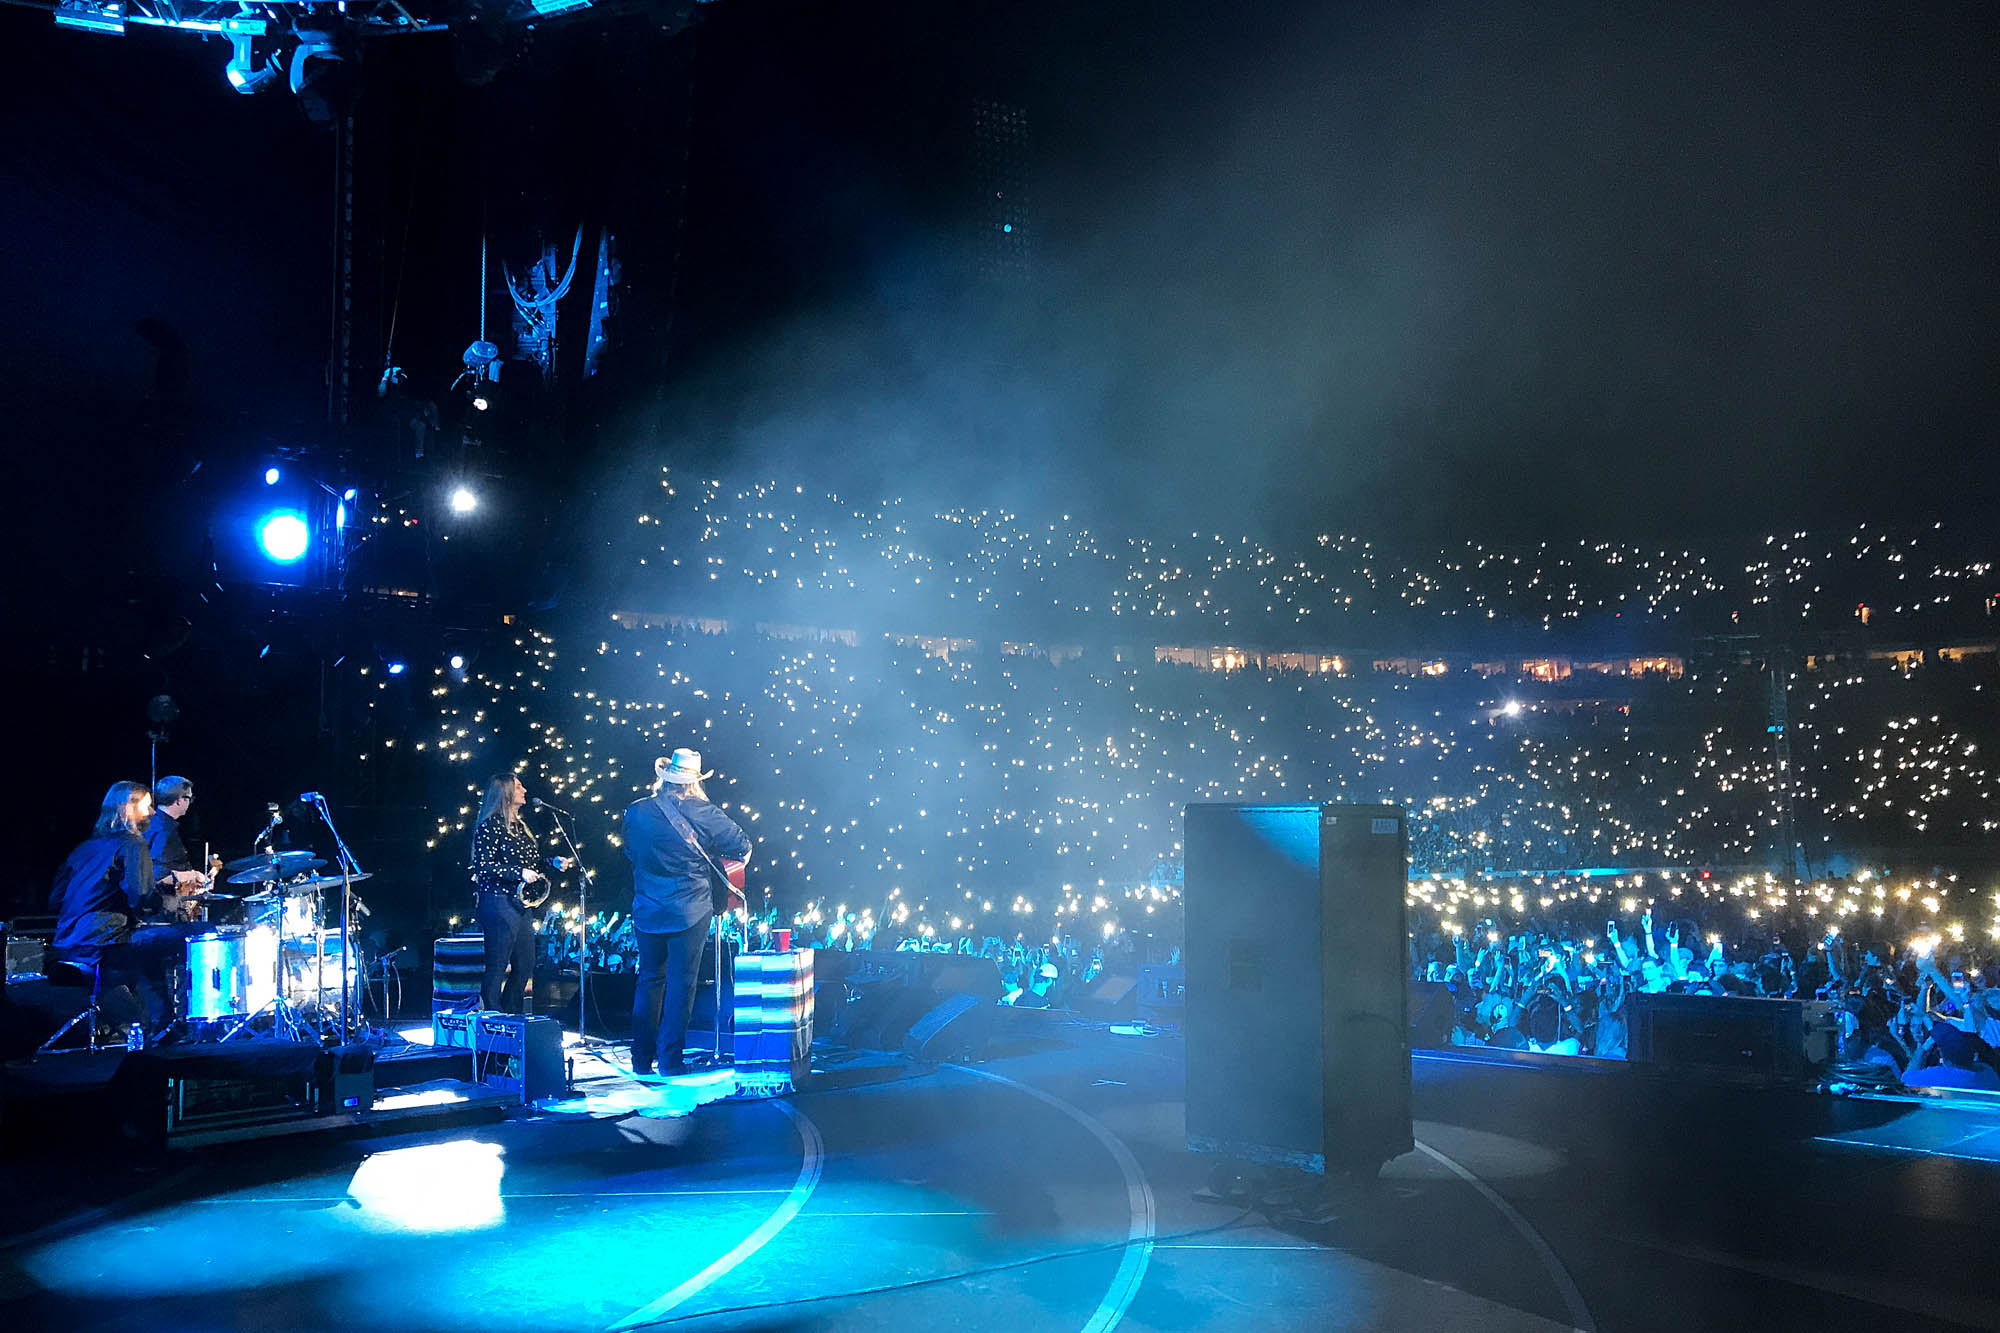 Chris Stapleton sings to a large stadium crowd